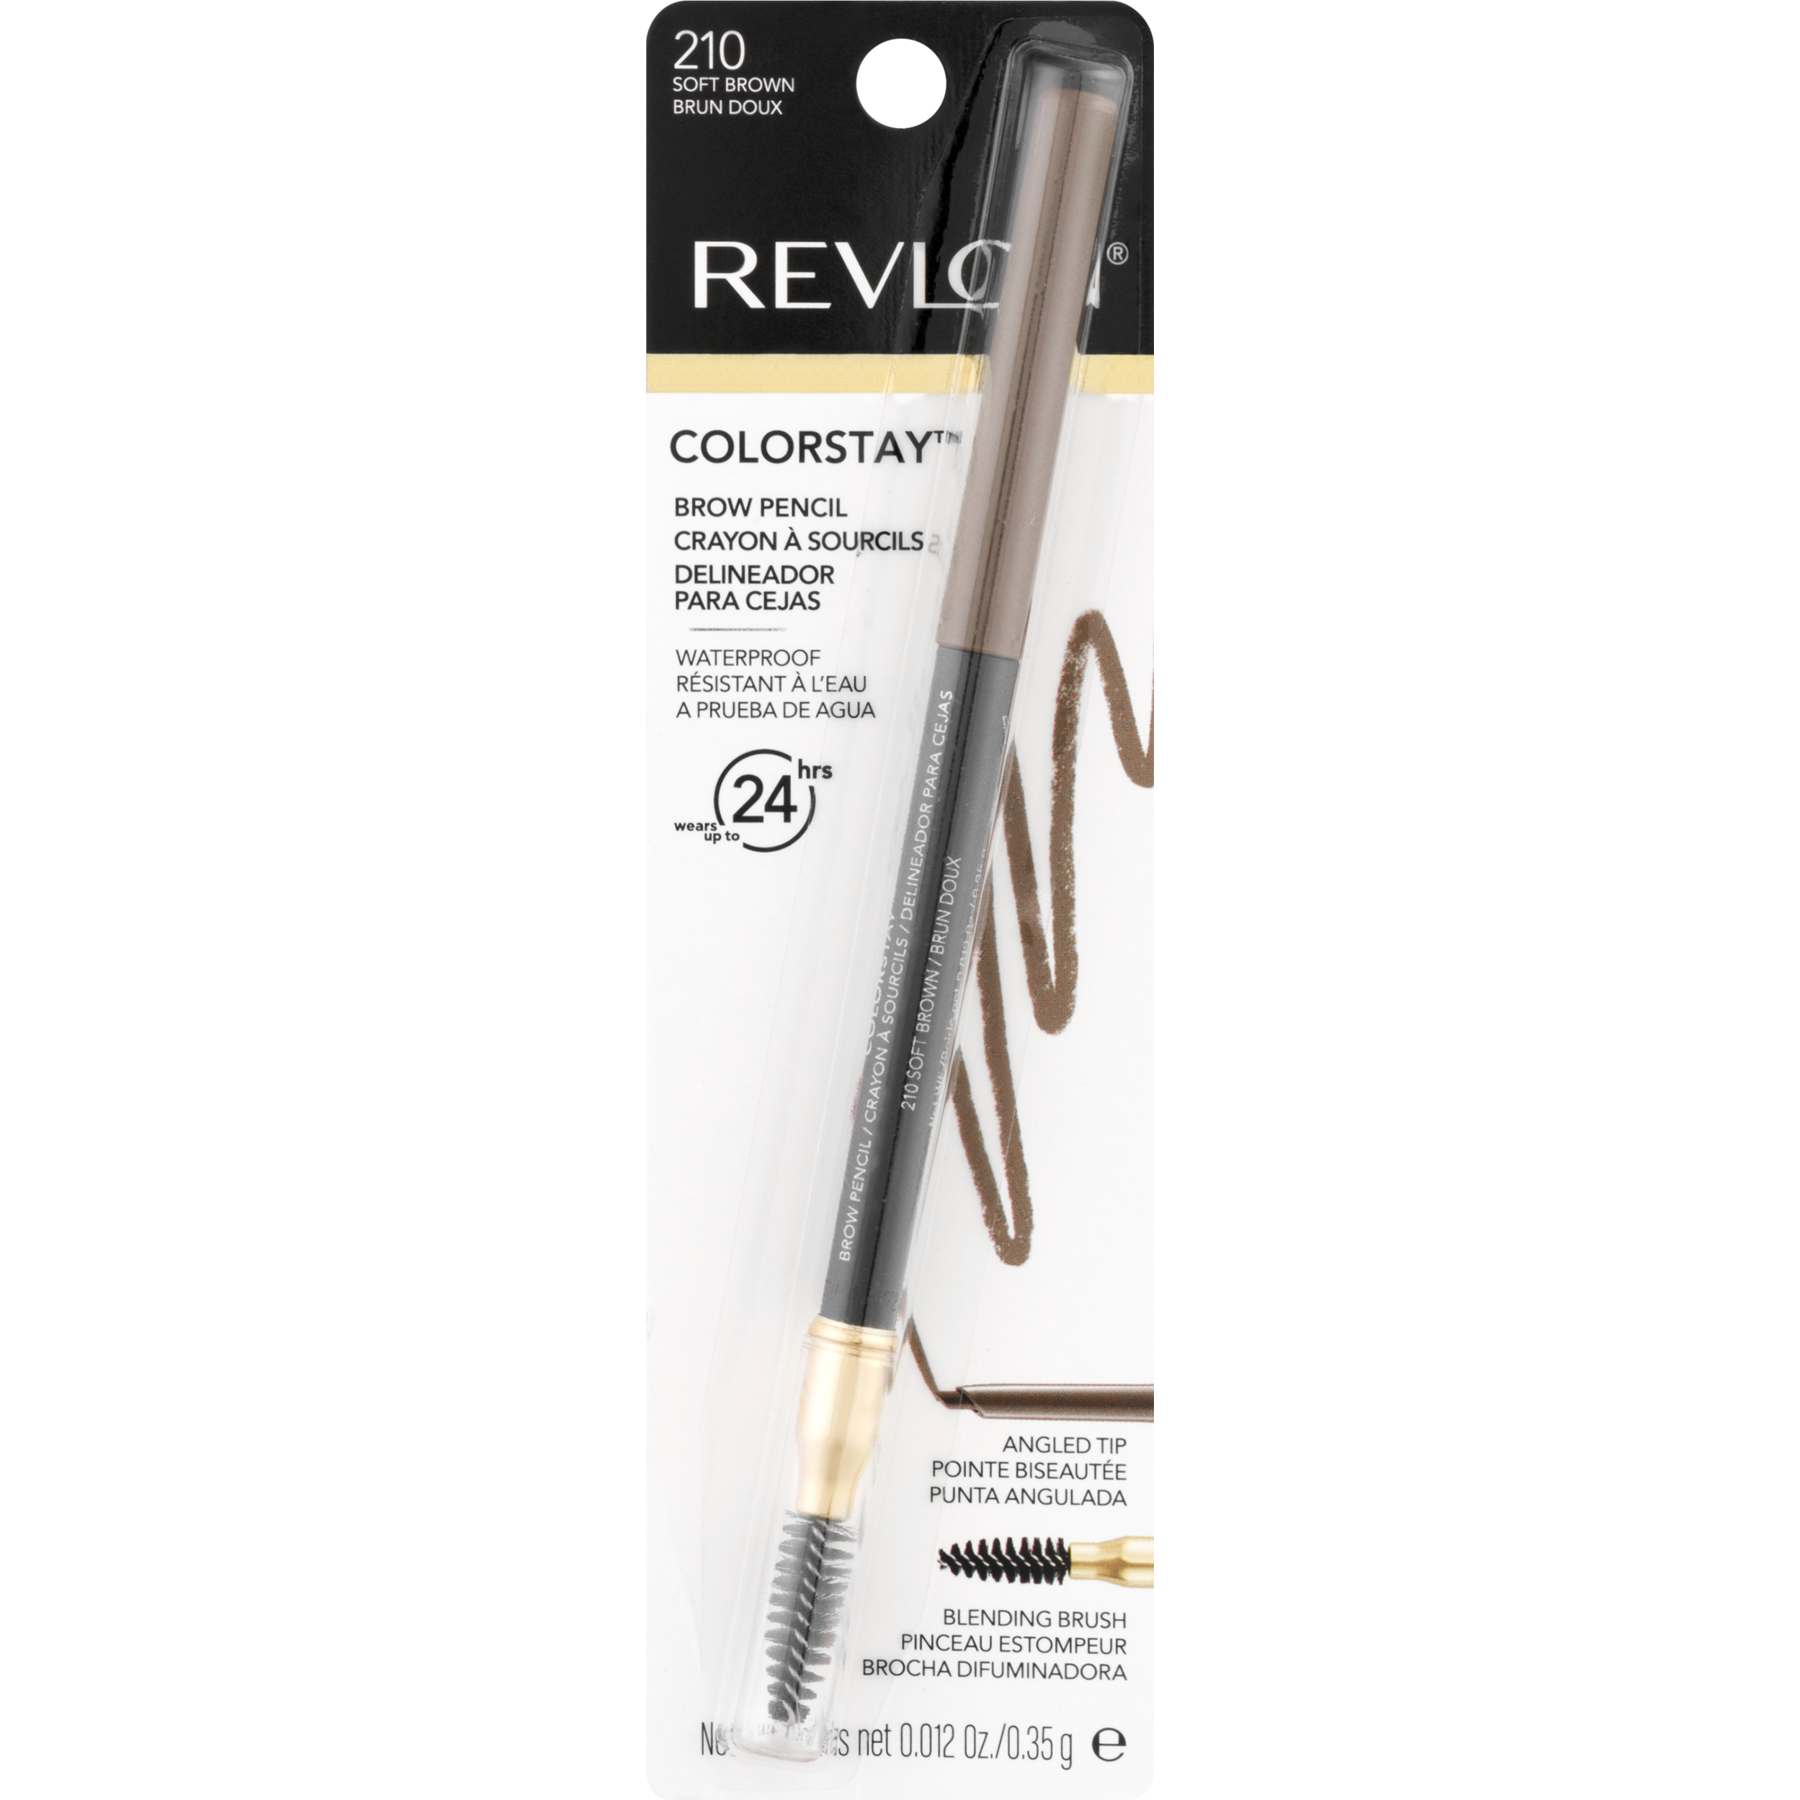 Revlon Colorstay Brow Pencil Waterproof Dark Brown Walmart